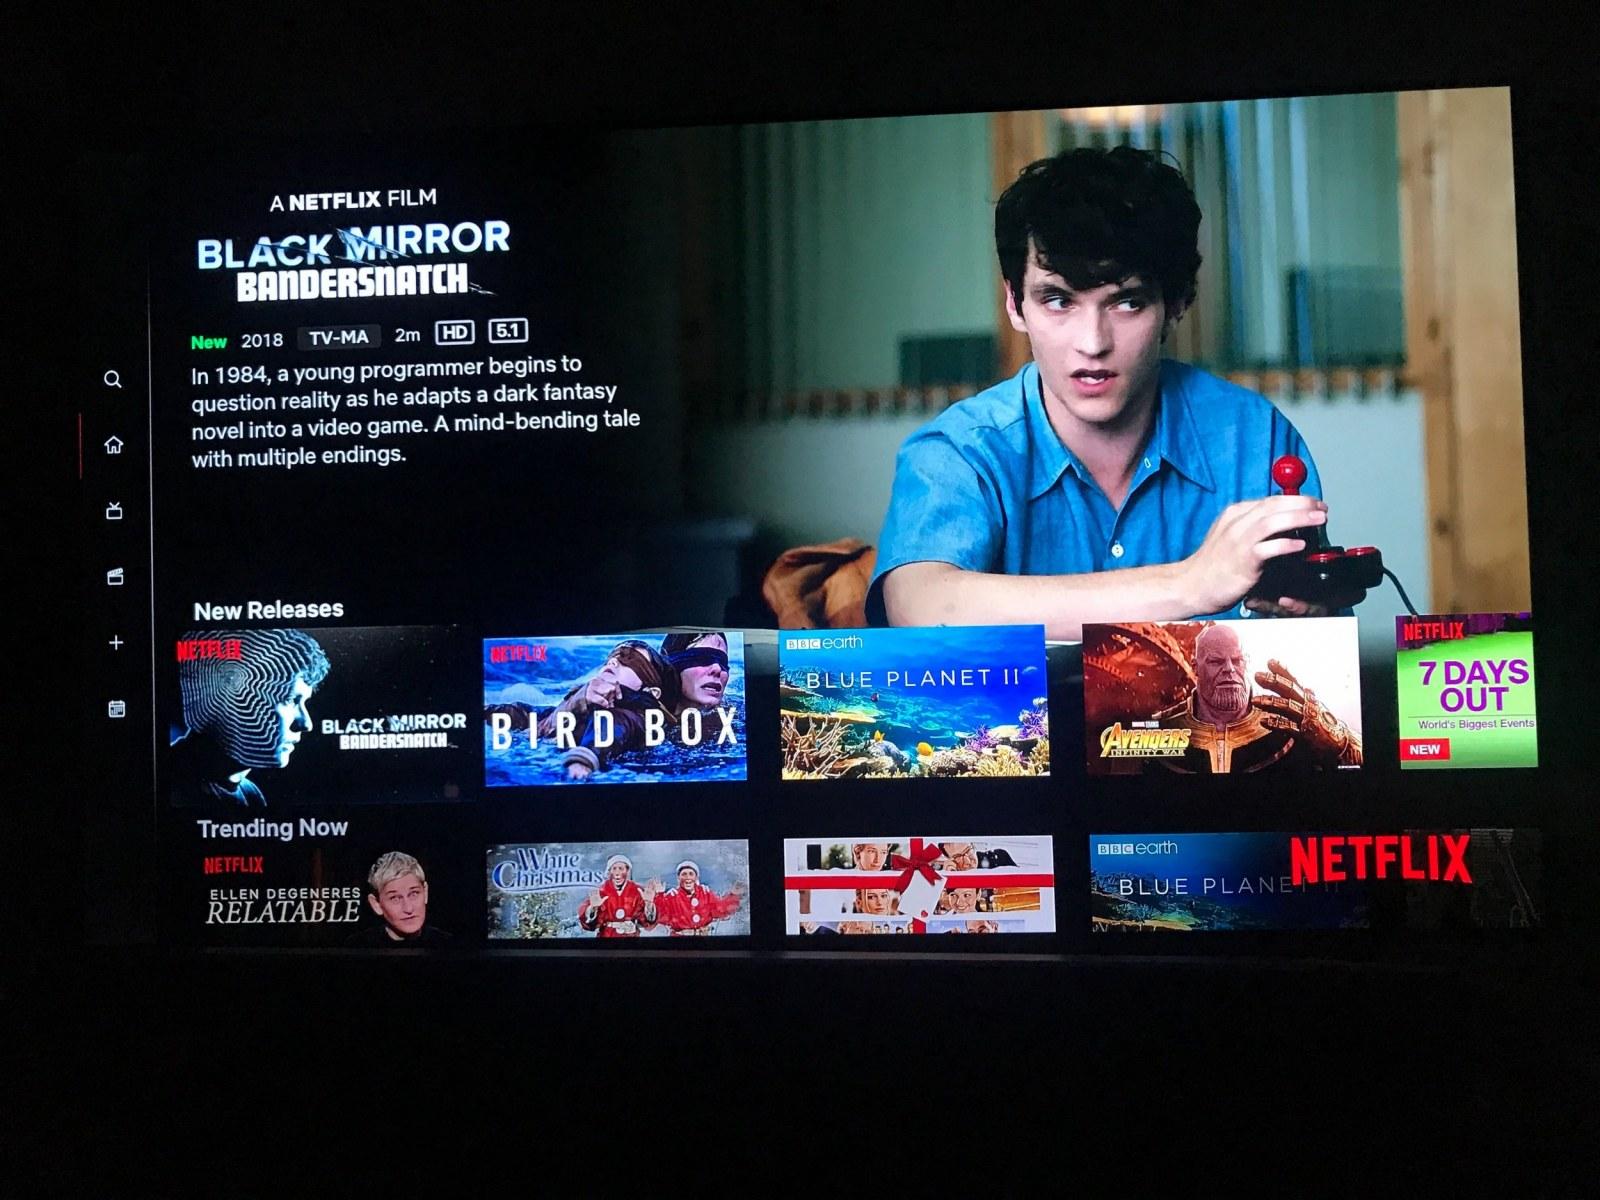 Bandersnatch' Not Working on Apple TV, Chromecast? Netflix's New